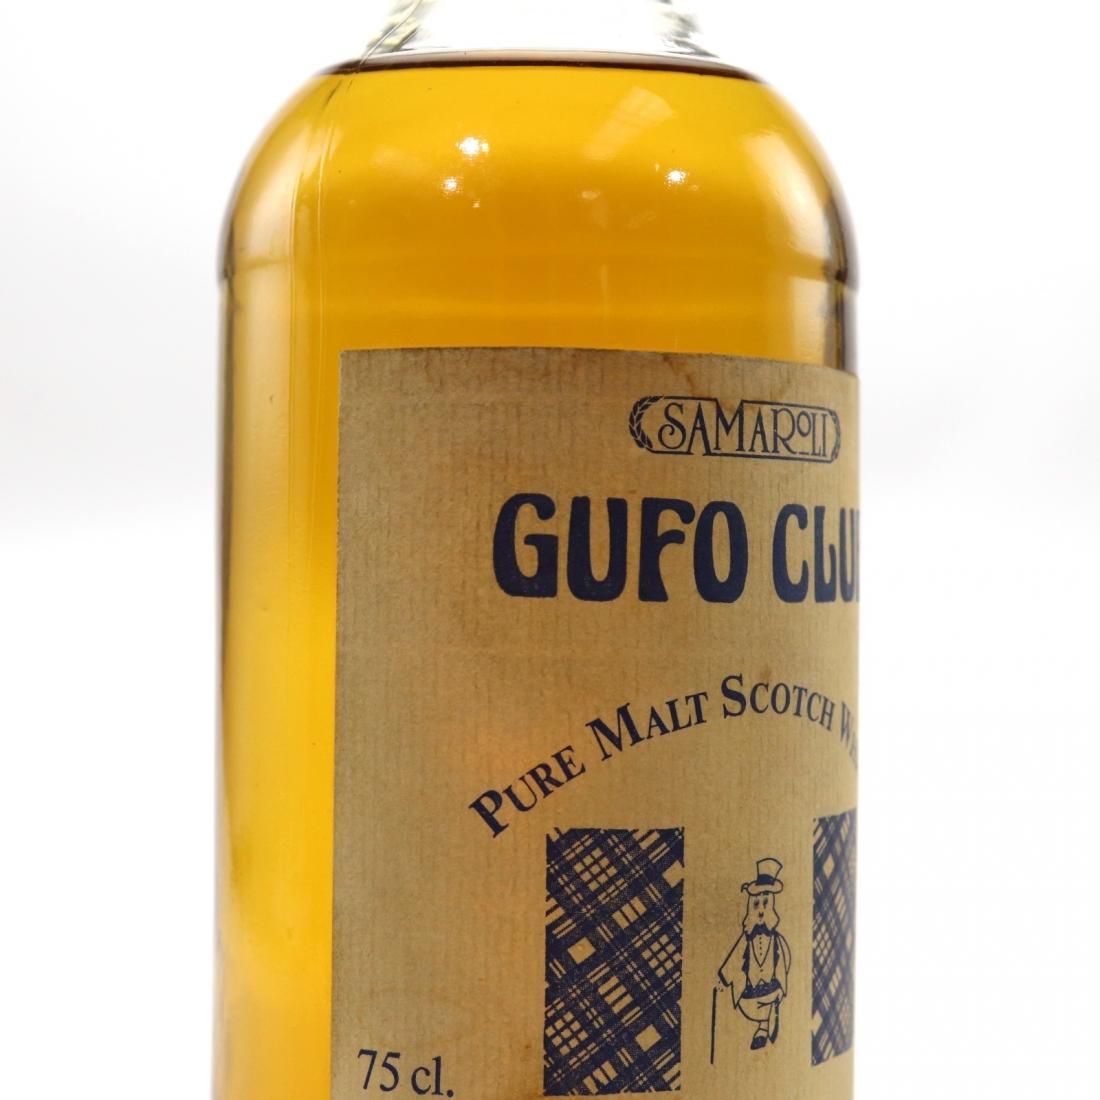 Aultmore 1973 Samaroli / Gufo Club